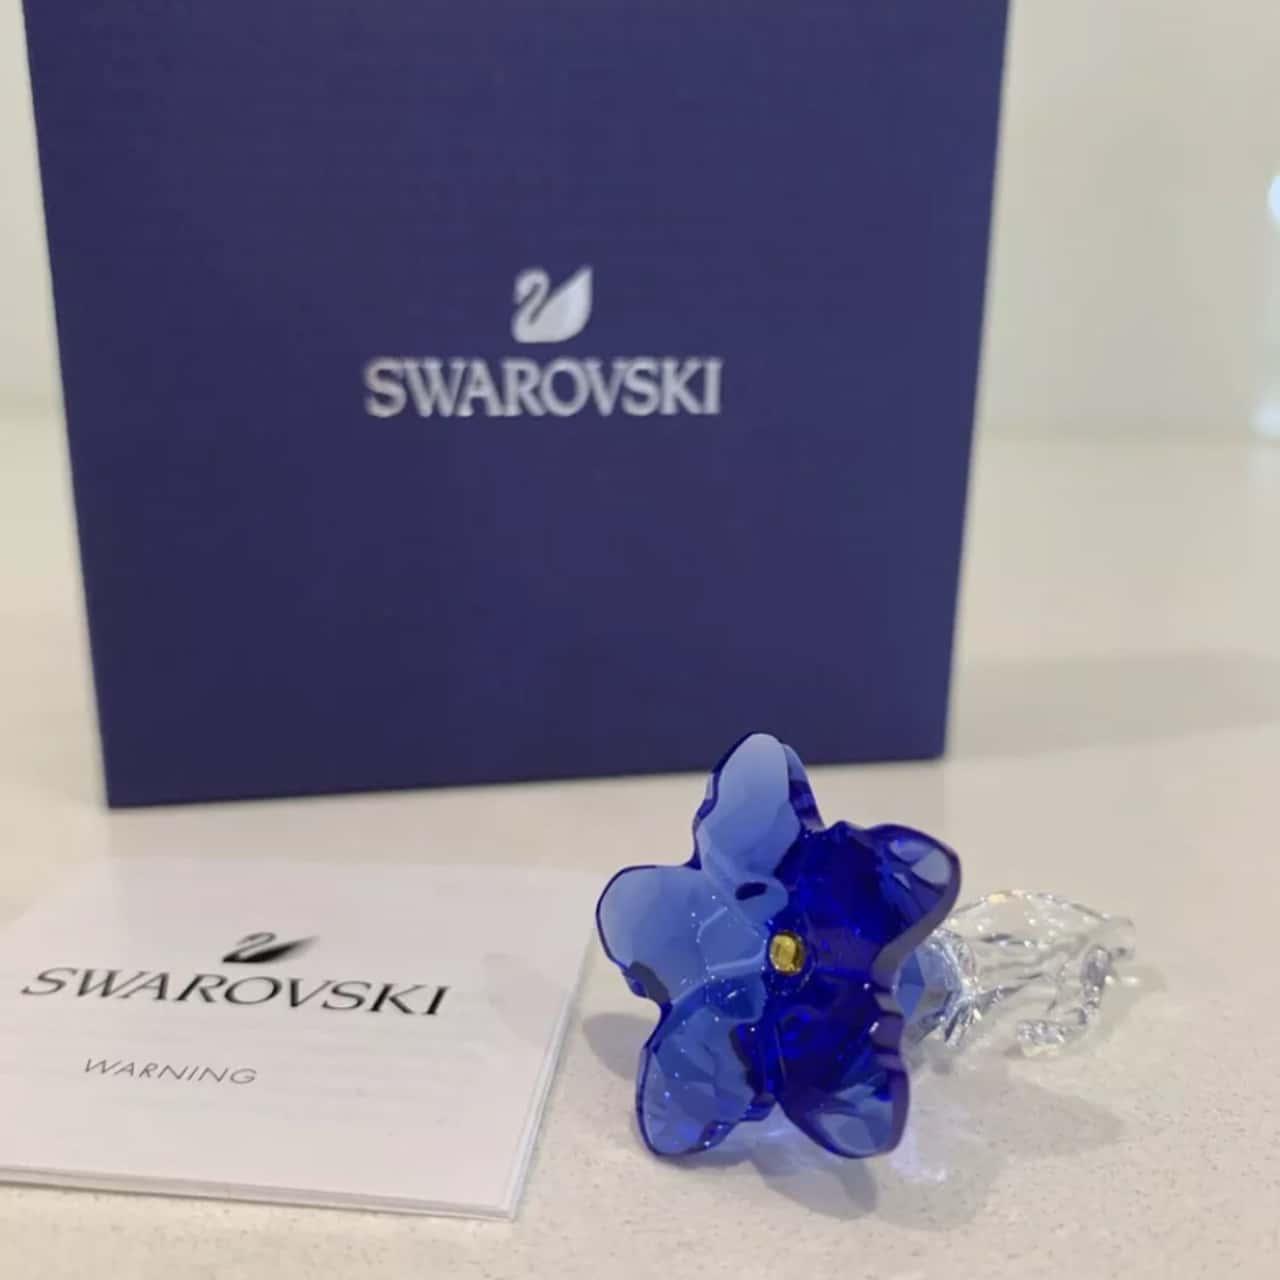 RETIRED SWAROVSKI CRYSTAL GENTIAN MEMBERSHIP 2020 #5490321